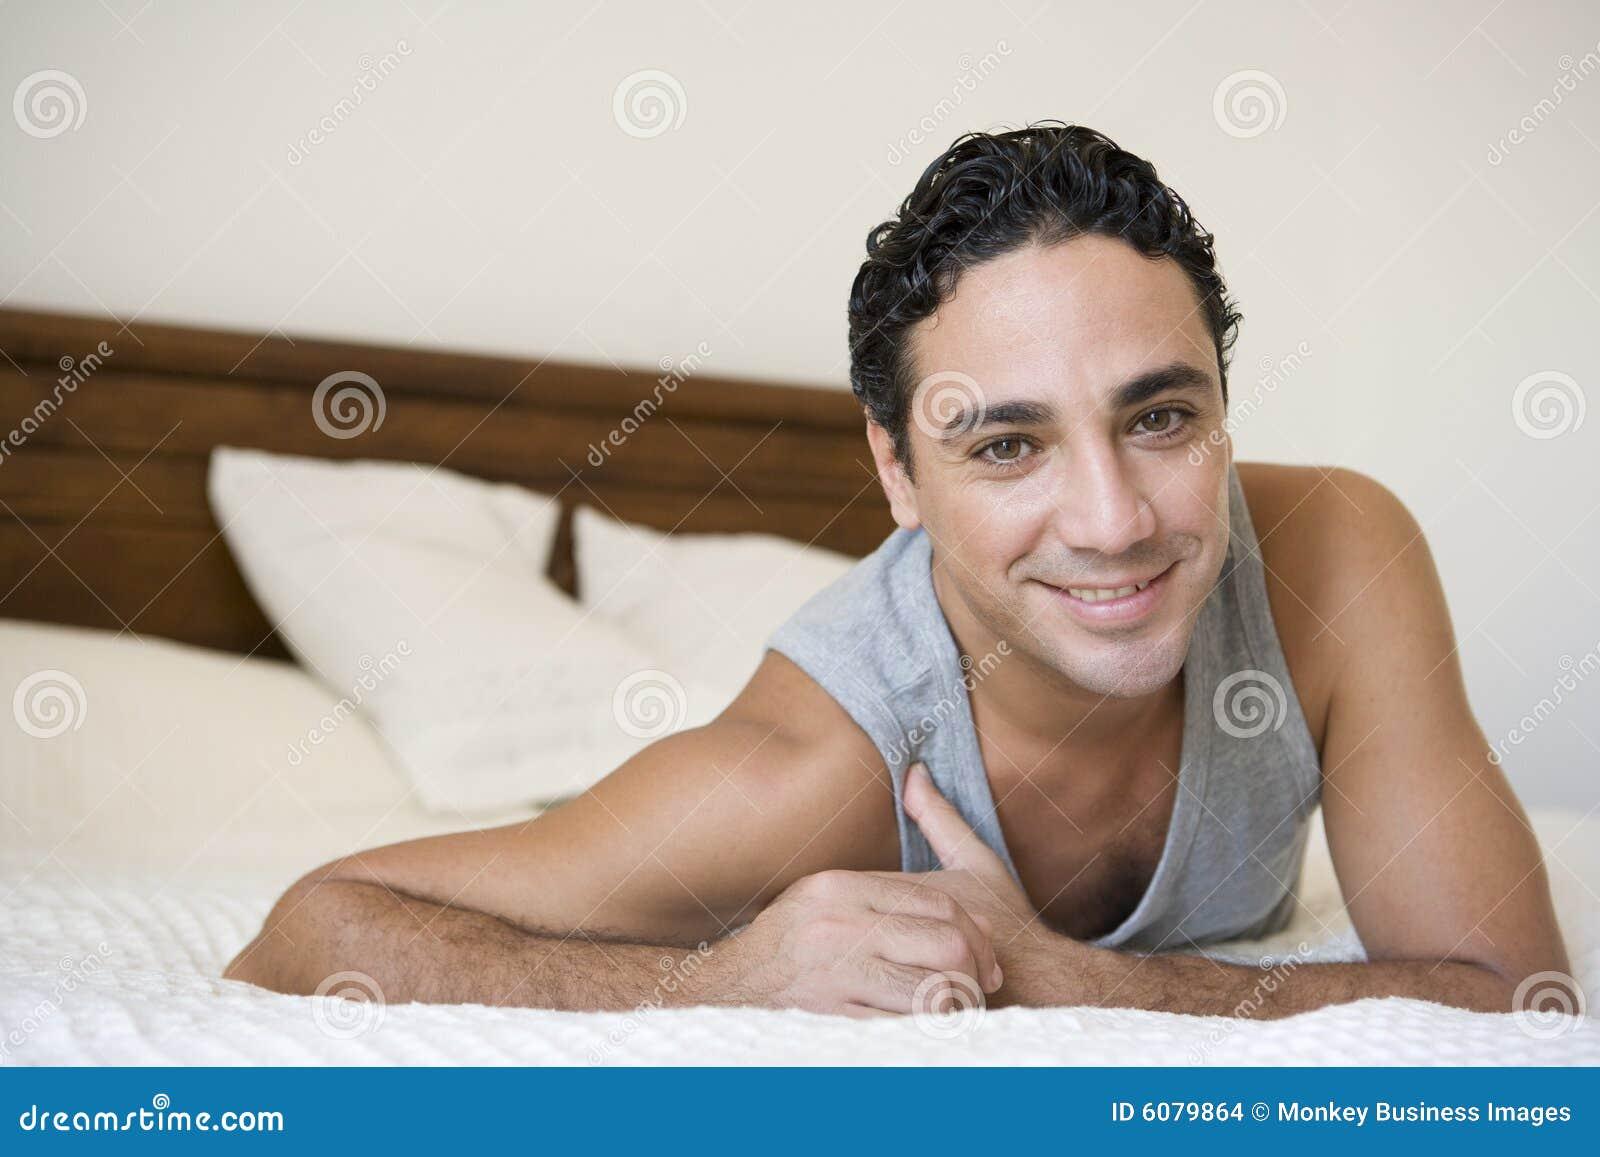 middle eastern single men in ona Middle eastern single women seeking men - personal ads and photos.